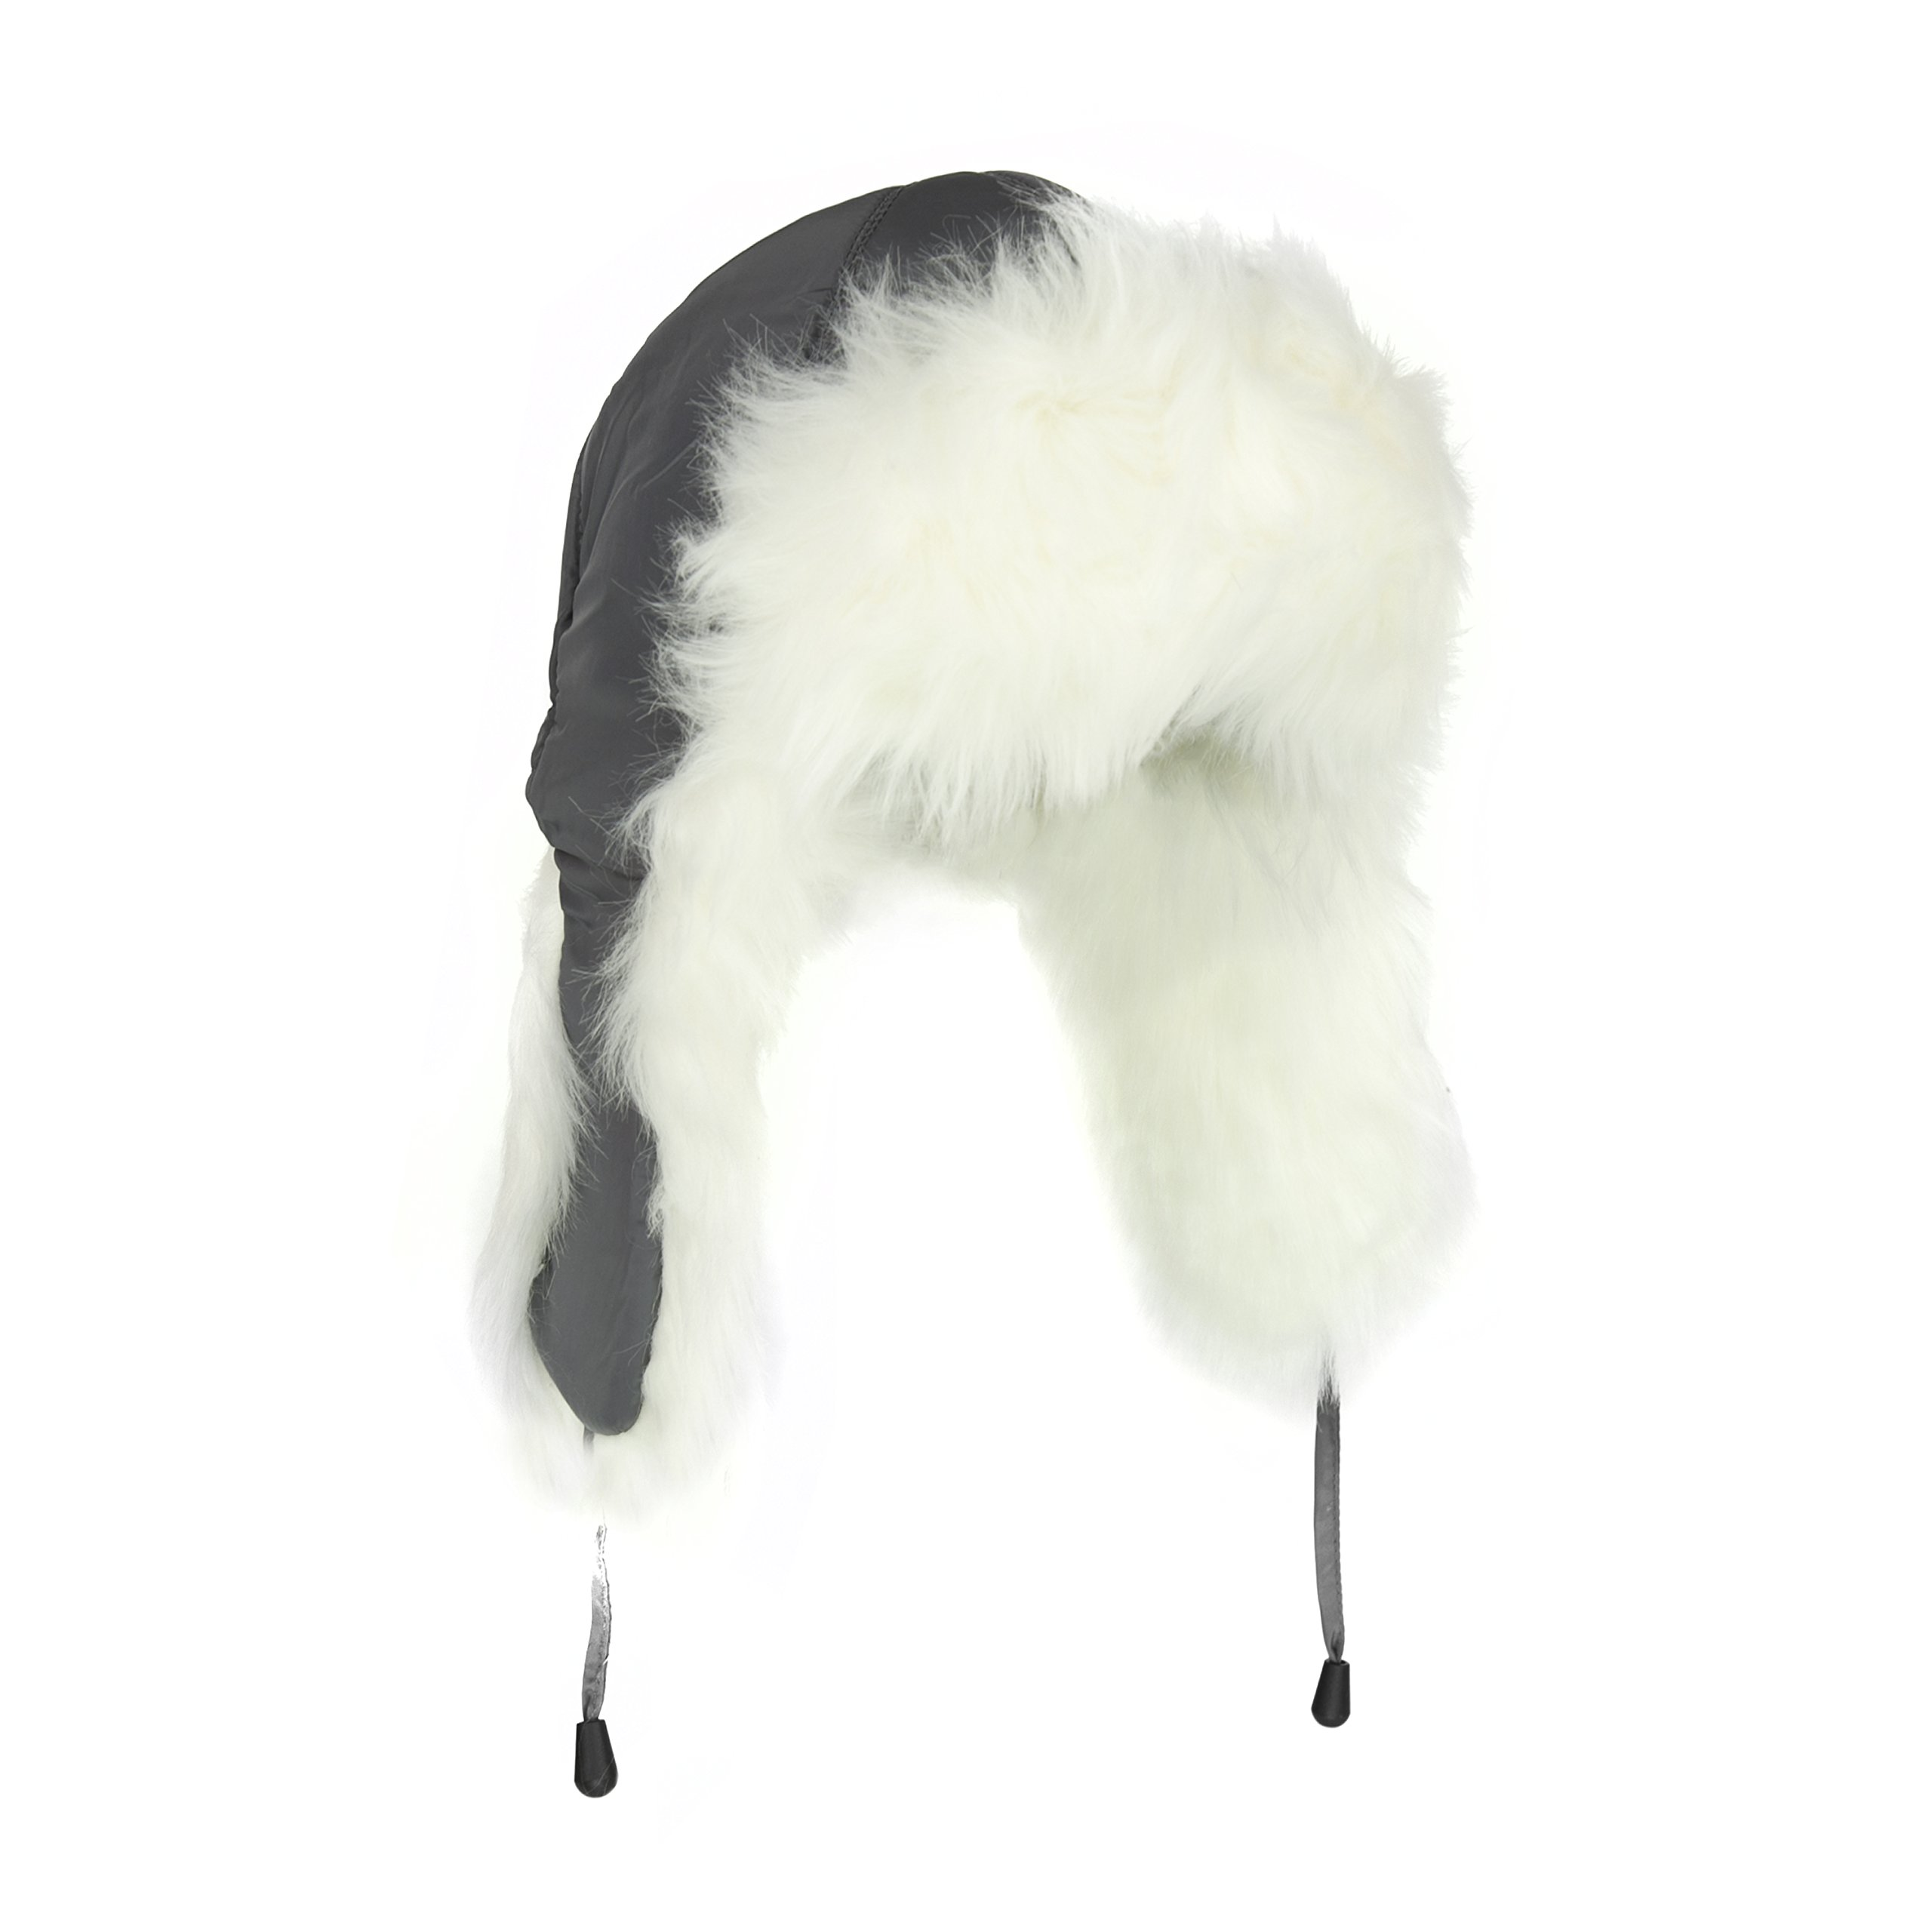 Adorable White Fur Trooper Hat, Warm Grey Peruvian Cap for Women w/ Tie